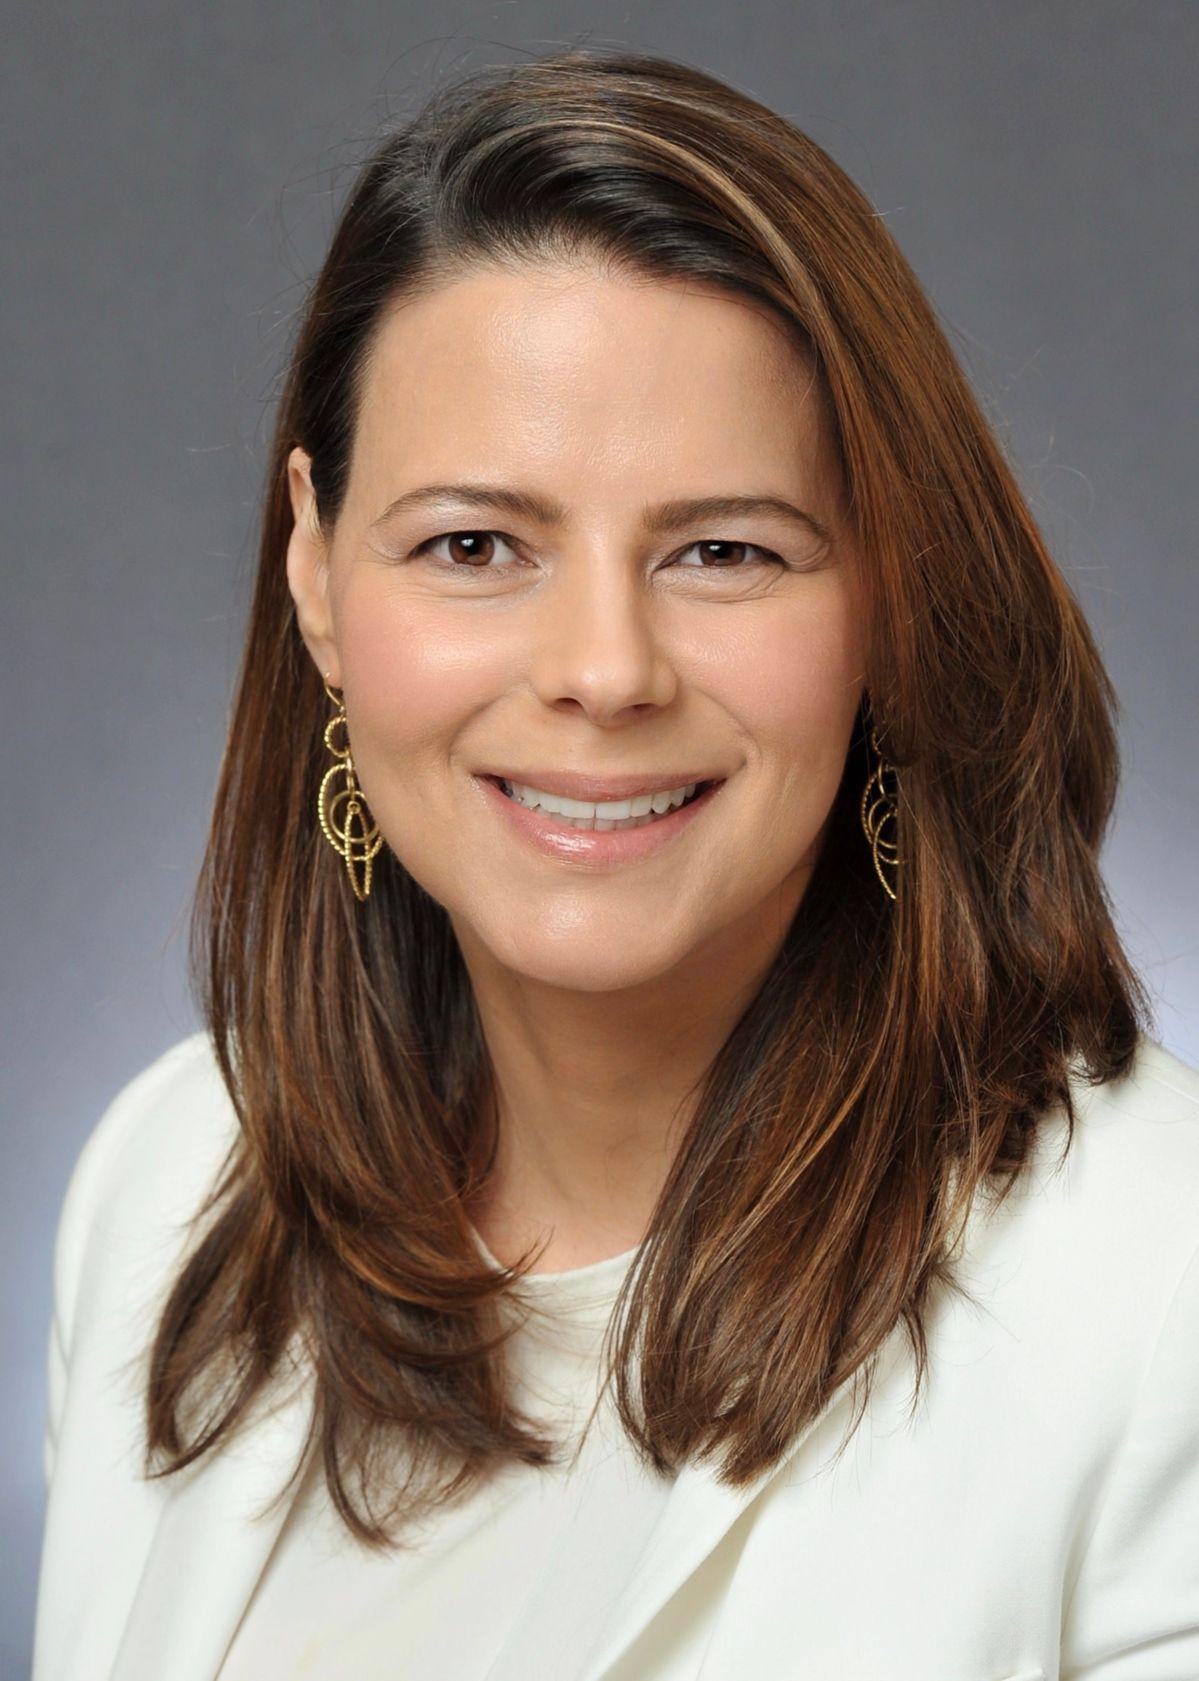 BJ's Wholesale Club Holdings, Inc. Announces Monica Schwartz as Senior Vice President, Chief Digital Officer, BJ's